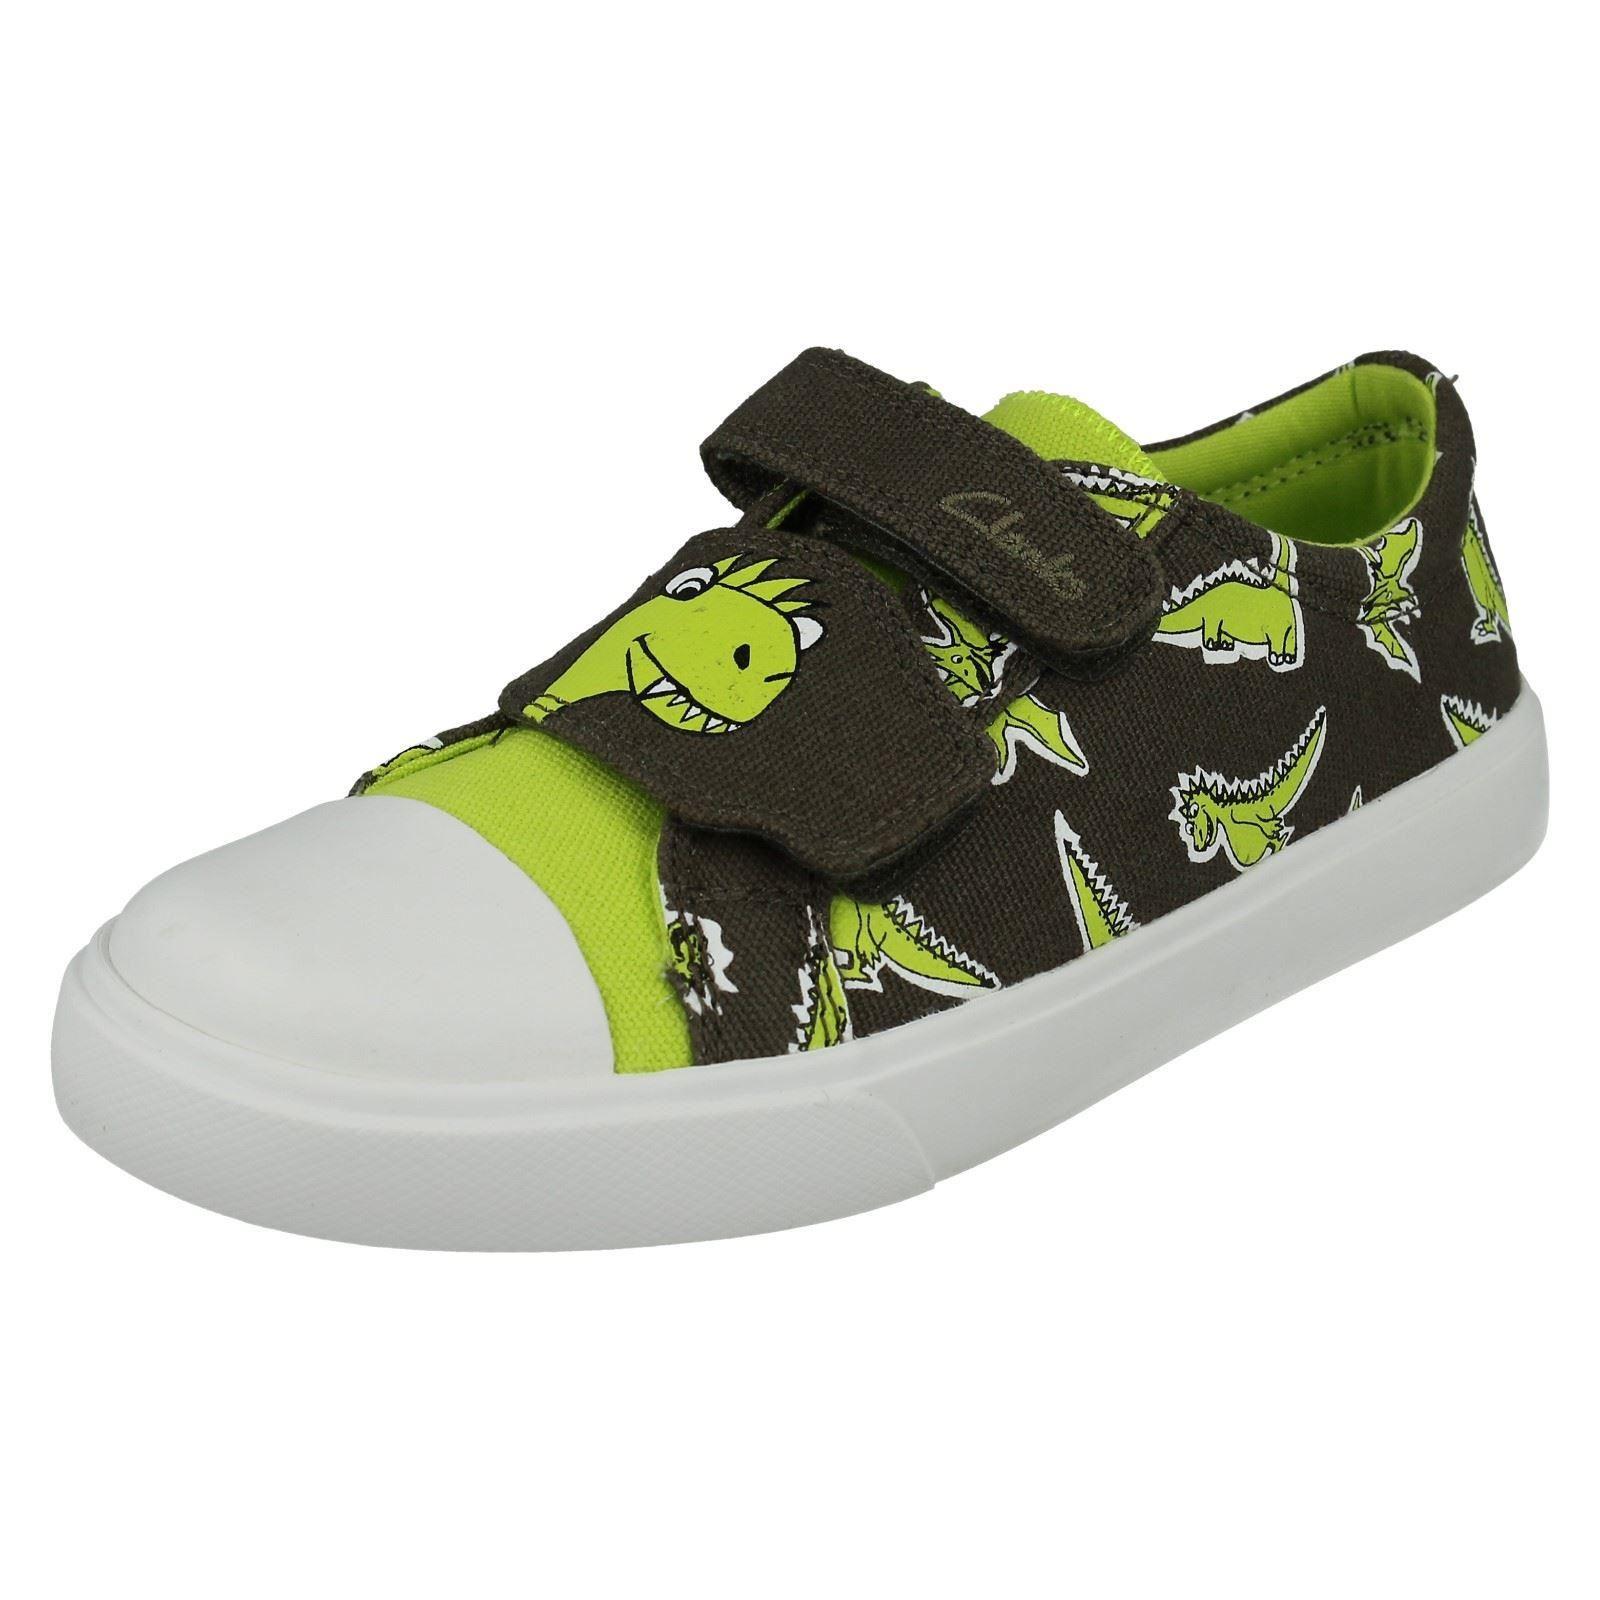 Boys Clarks Shoes Label Tricer Roar